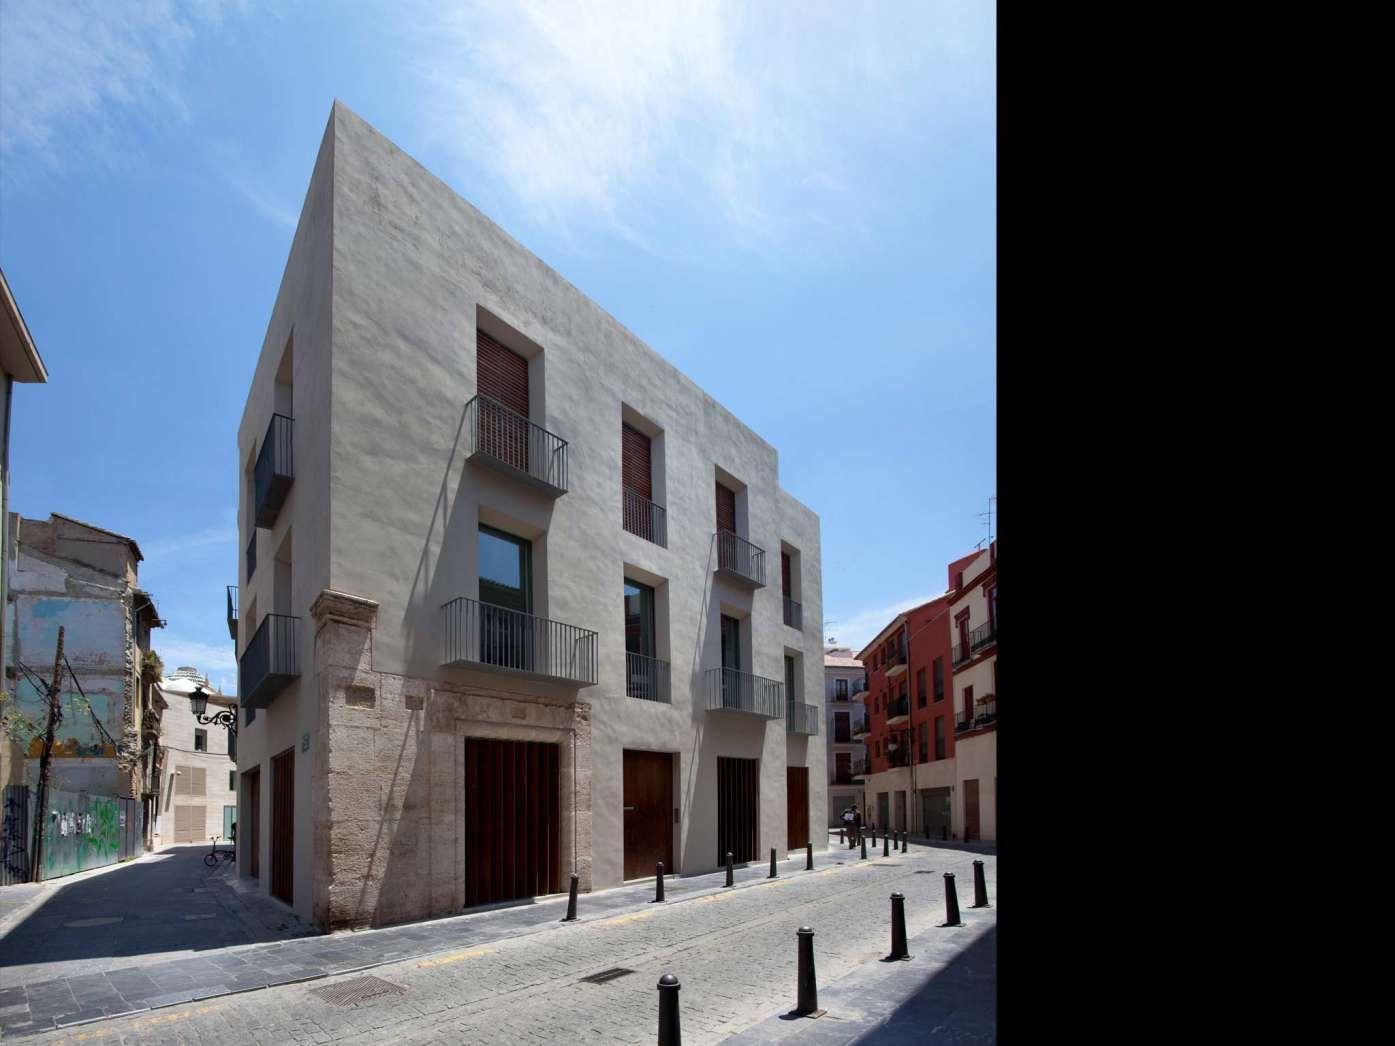 Ramón Esteve - House Studio in El Carmen. Nice and simple volume.